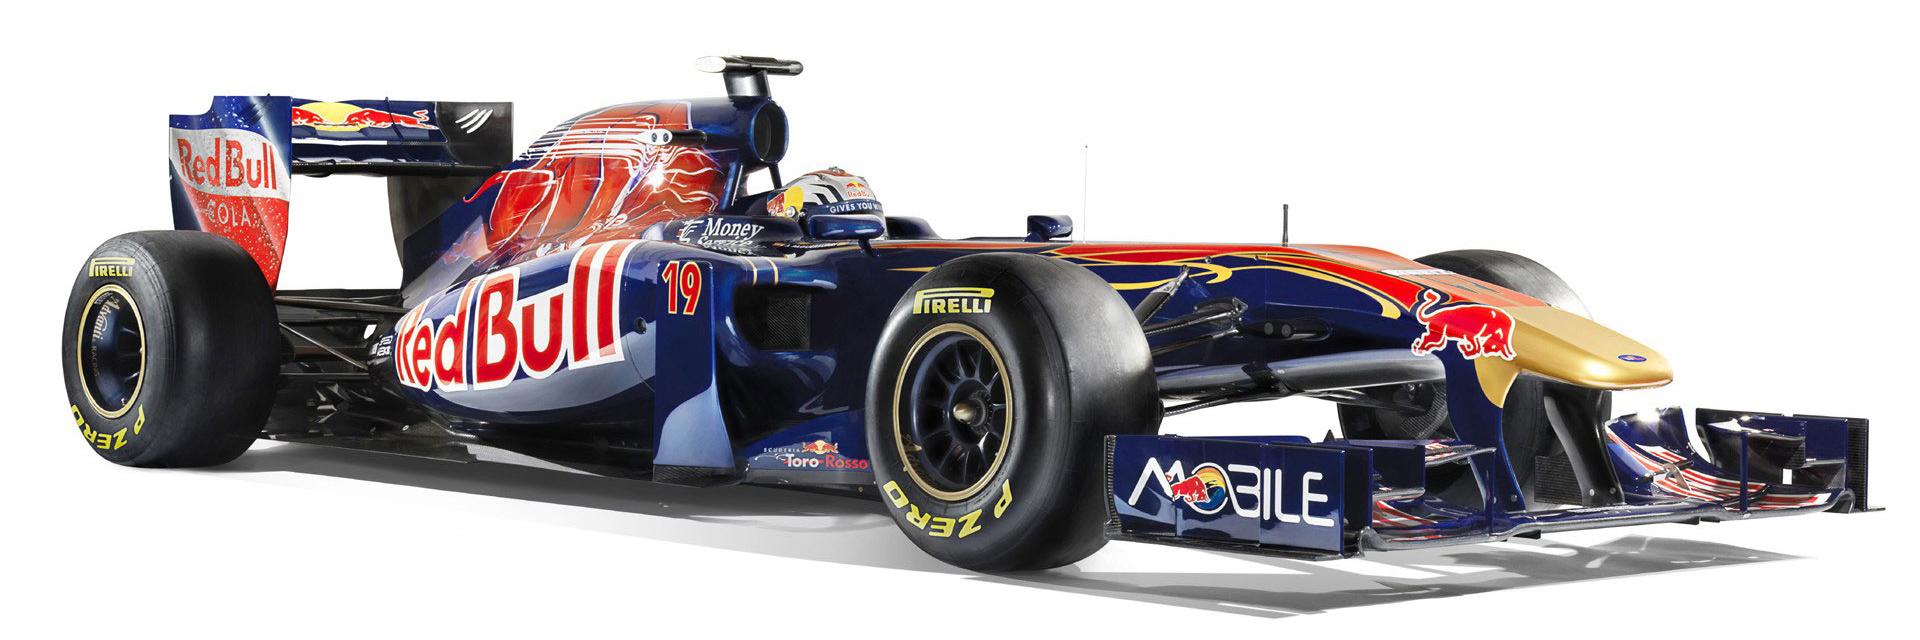 formula 1 sponsorship toro rosso